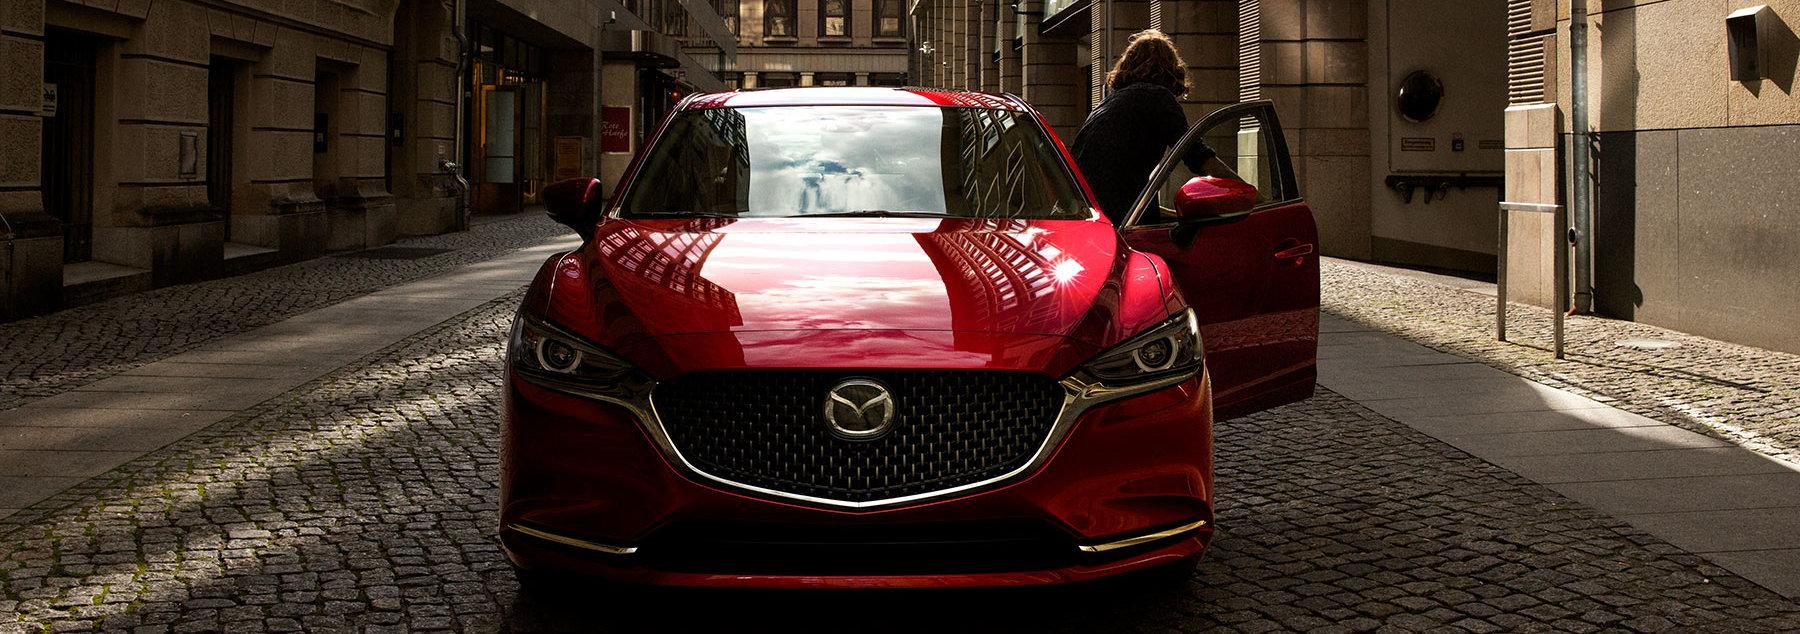 2019 Mazda6 Financing near Boerne, TX